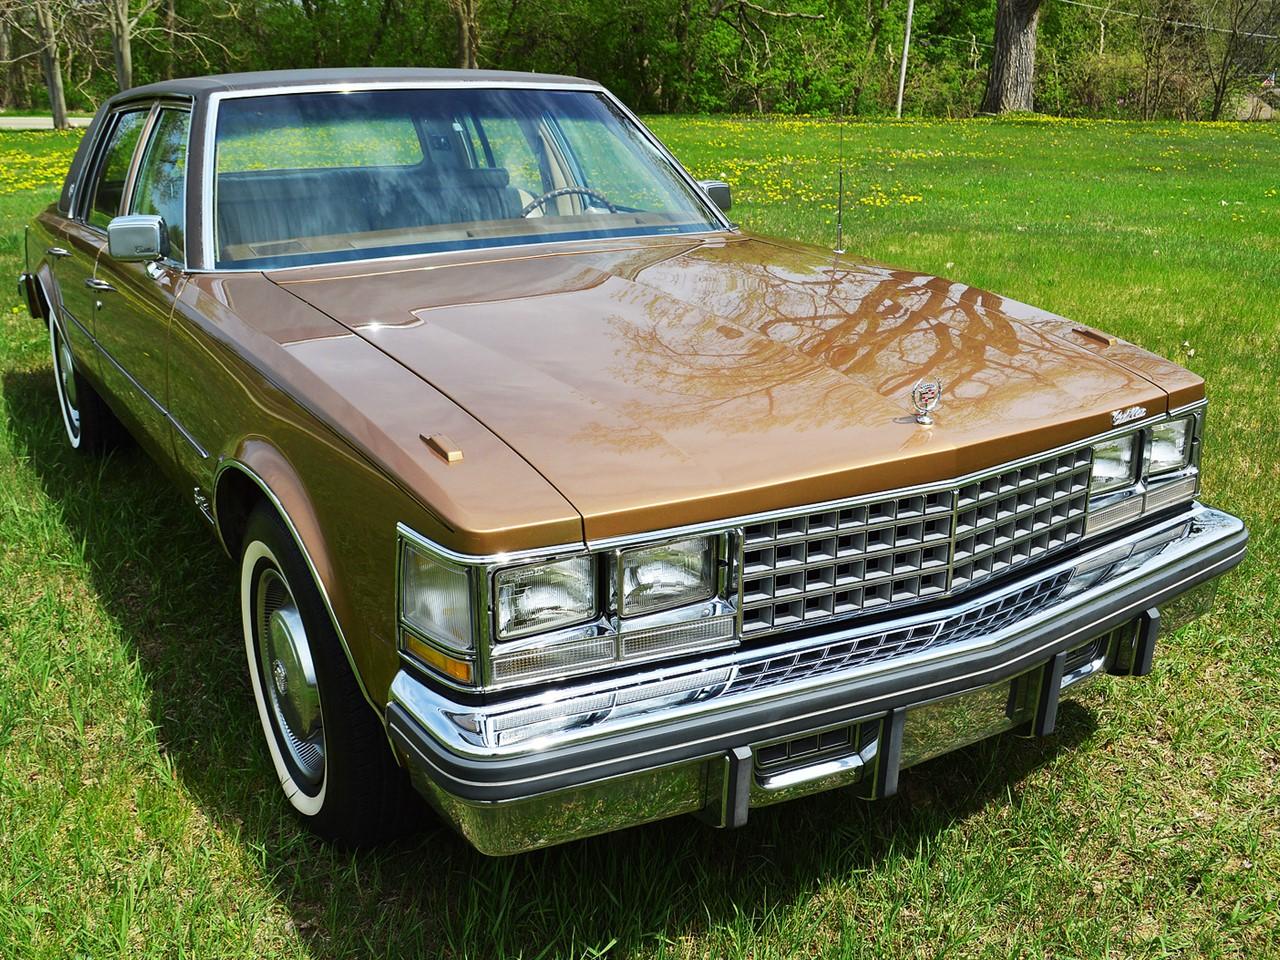 1976 Cadillac Seville 5